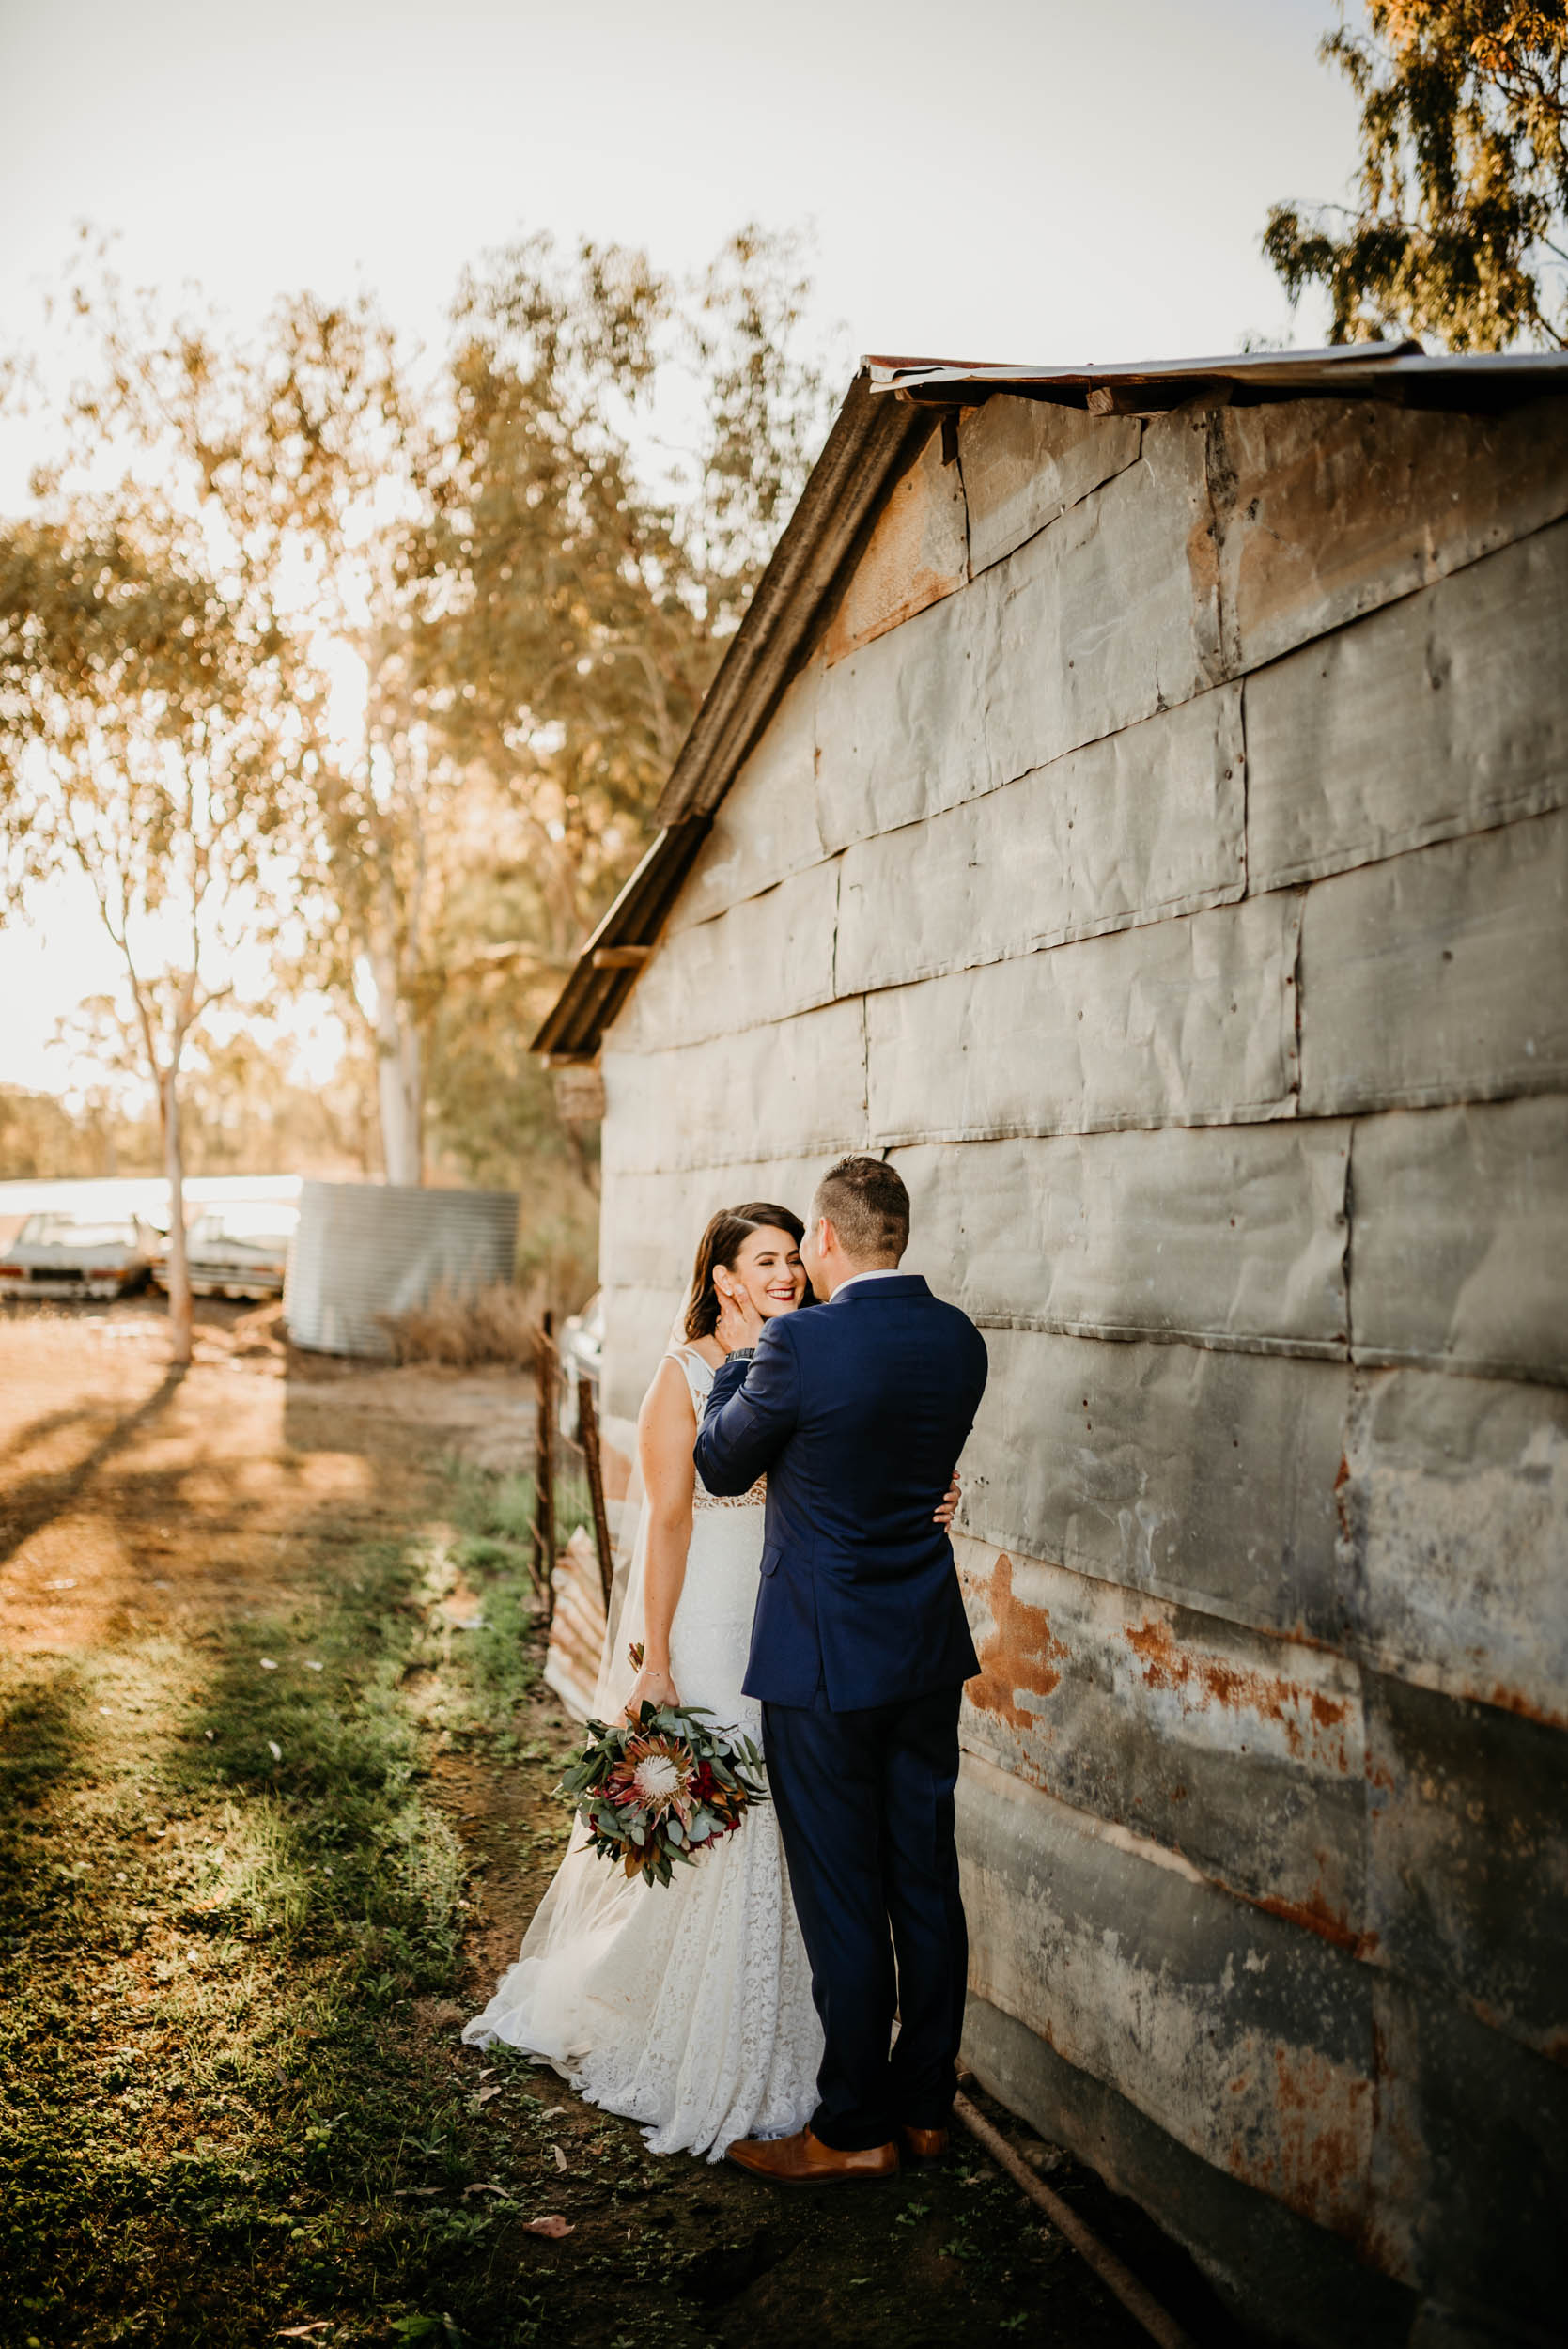 The Raw Photographer - Cairns and Port Douglas Wedding Photographer - Best of 2018-35.jpg